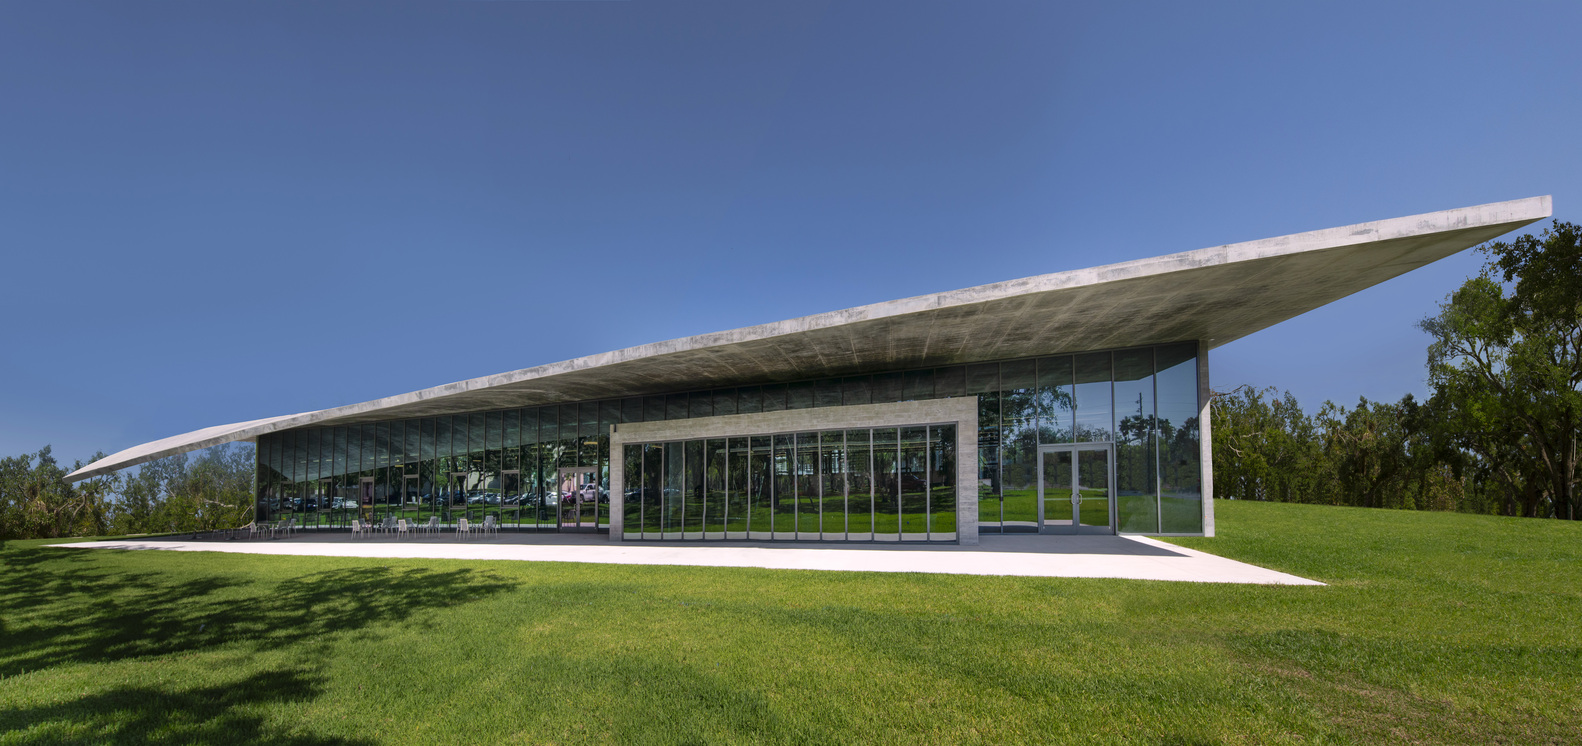 4_University of Miami School of Architecture_Arquitectonica_Inspirationist